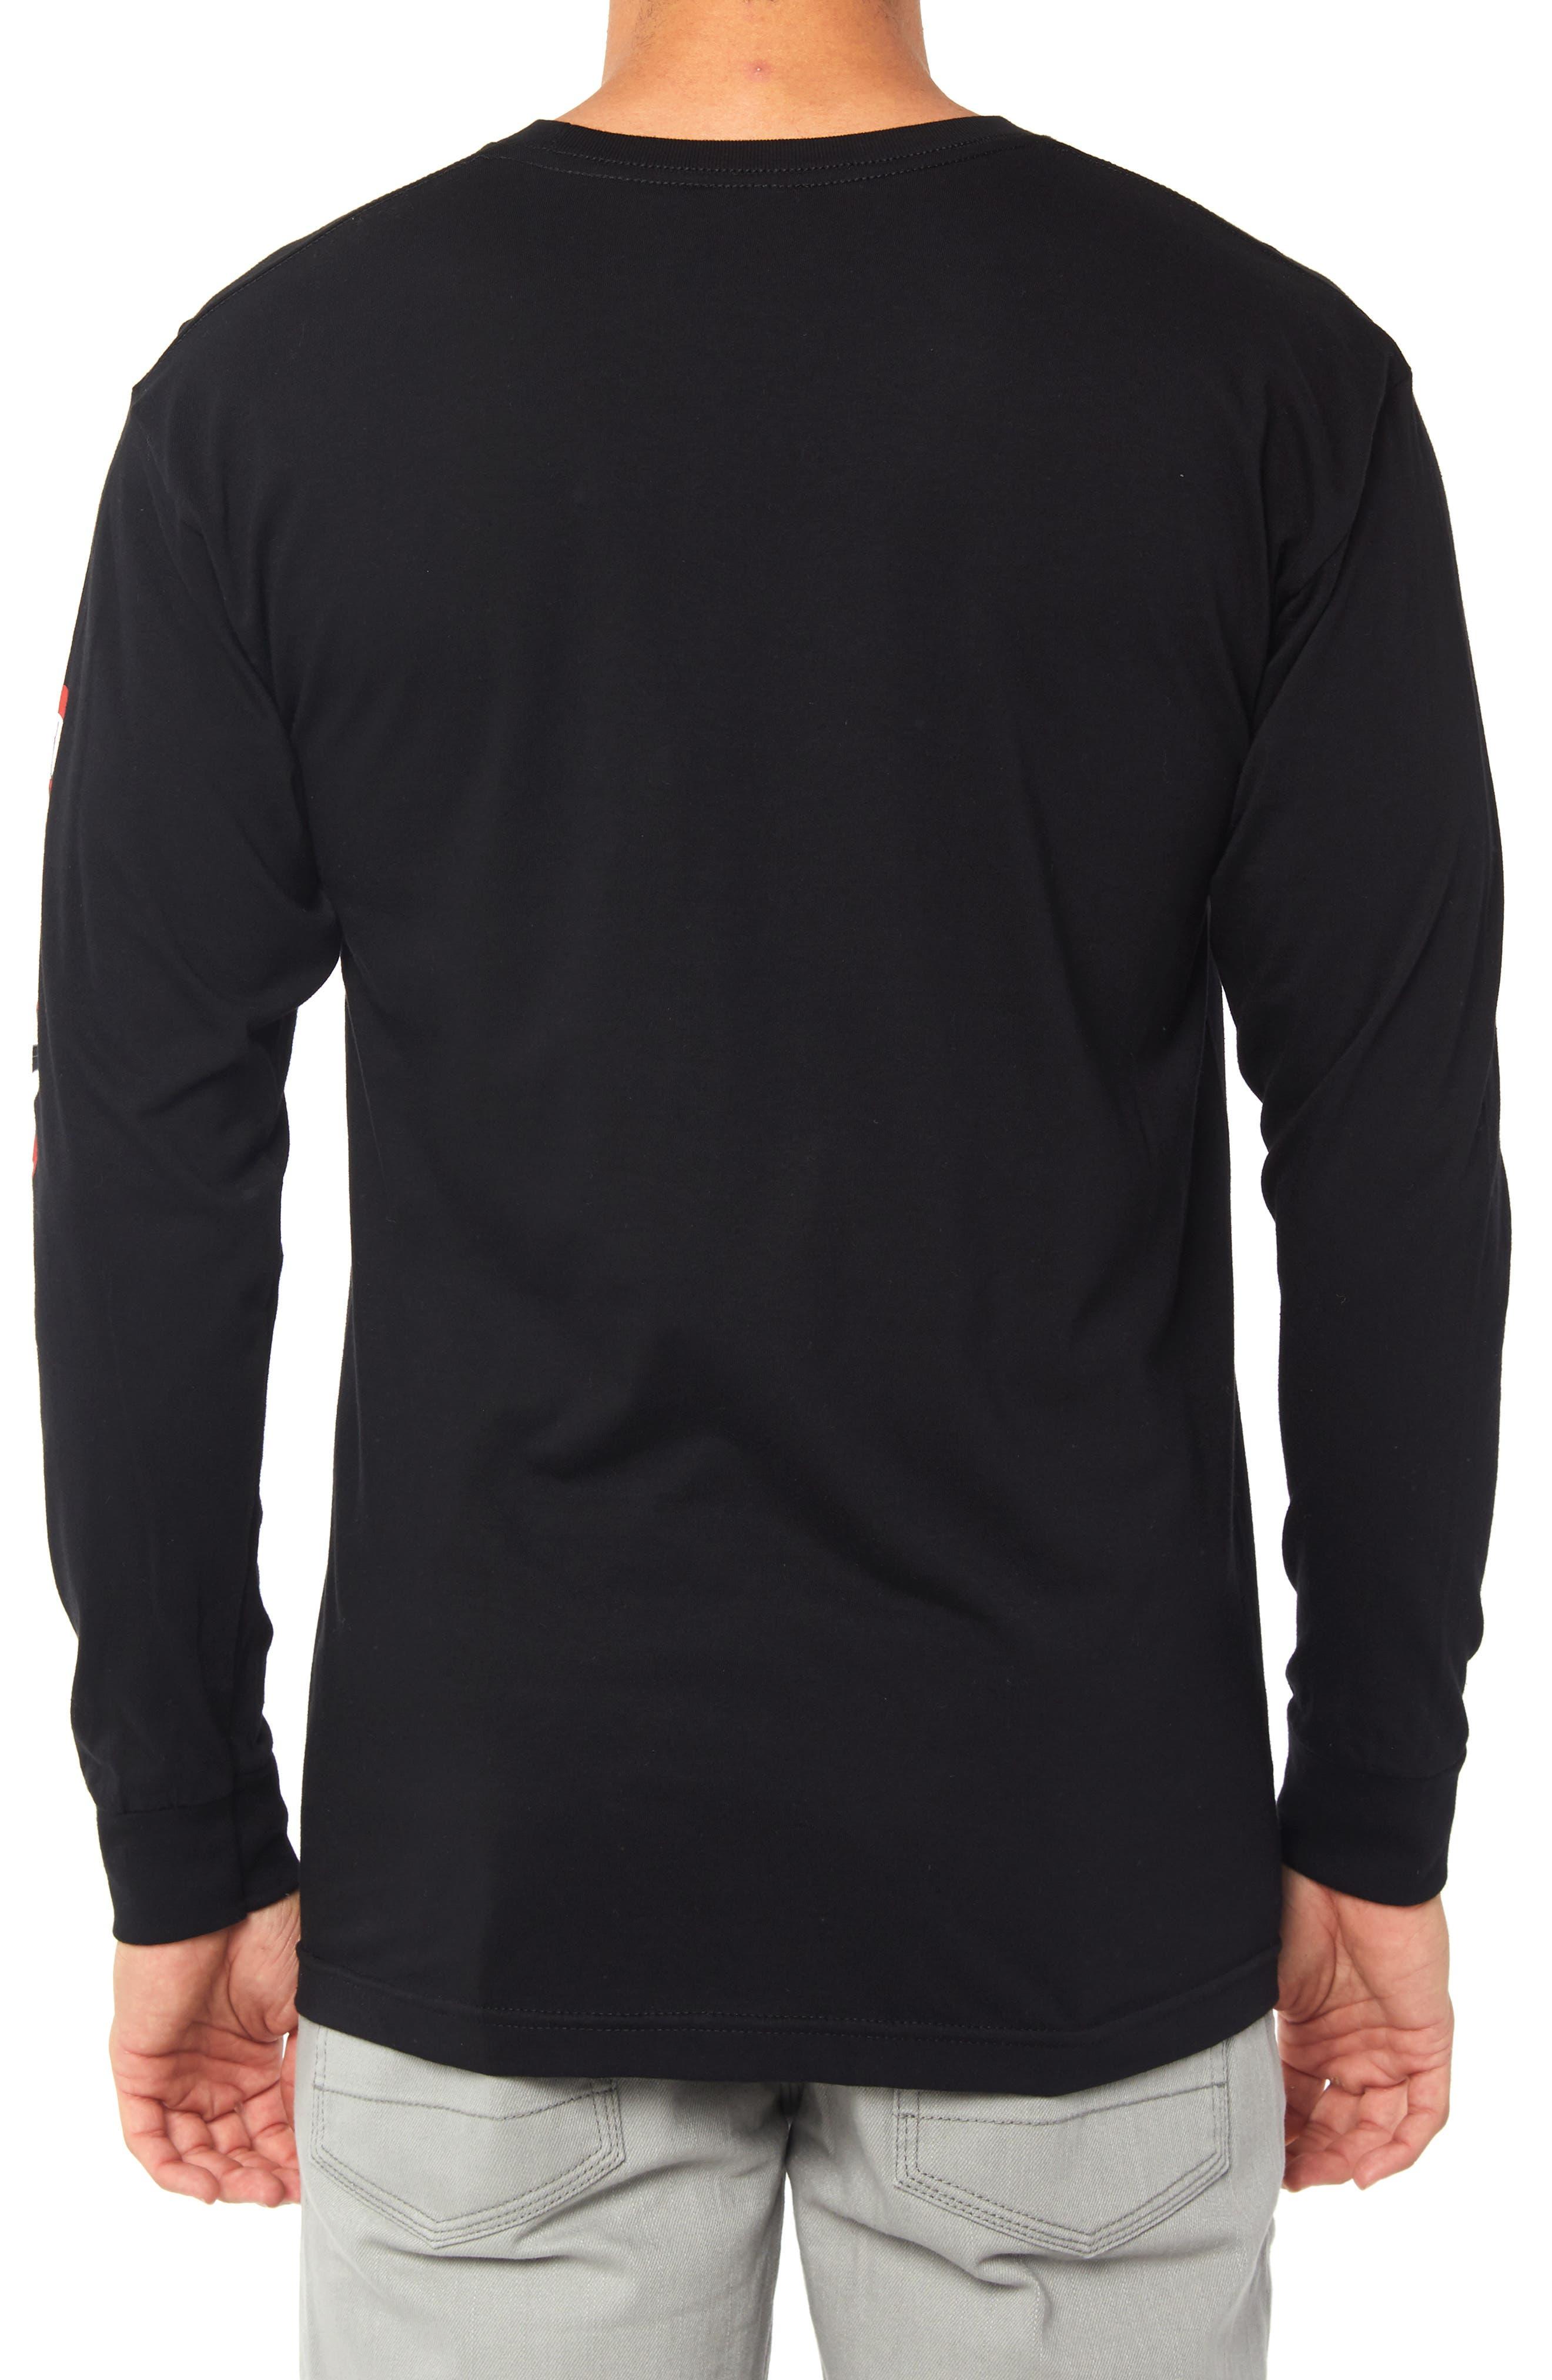 Pebbles Graphic Long Sleeve T-Shirt,                             Alternate thumbnail 2, color,                             BLACK